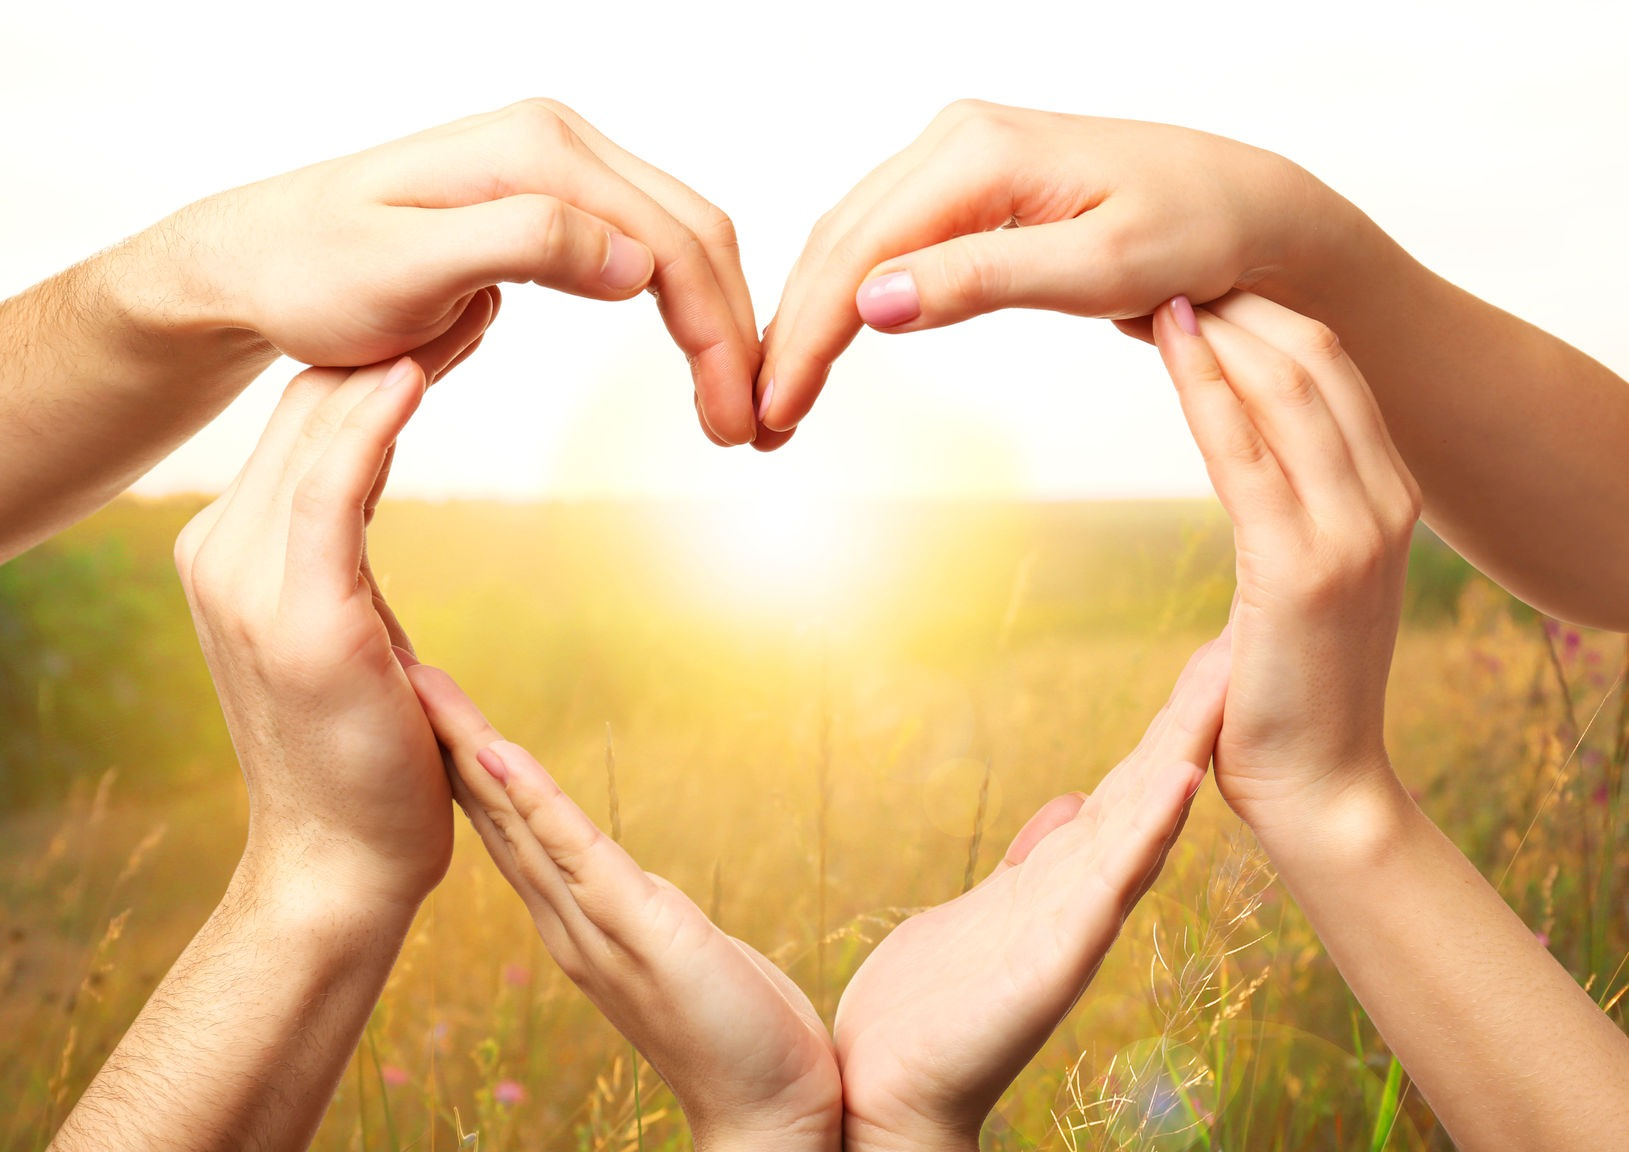 How Do Our Children Define Love